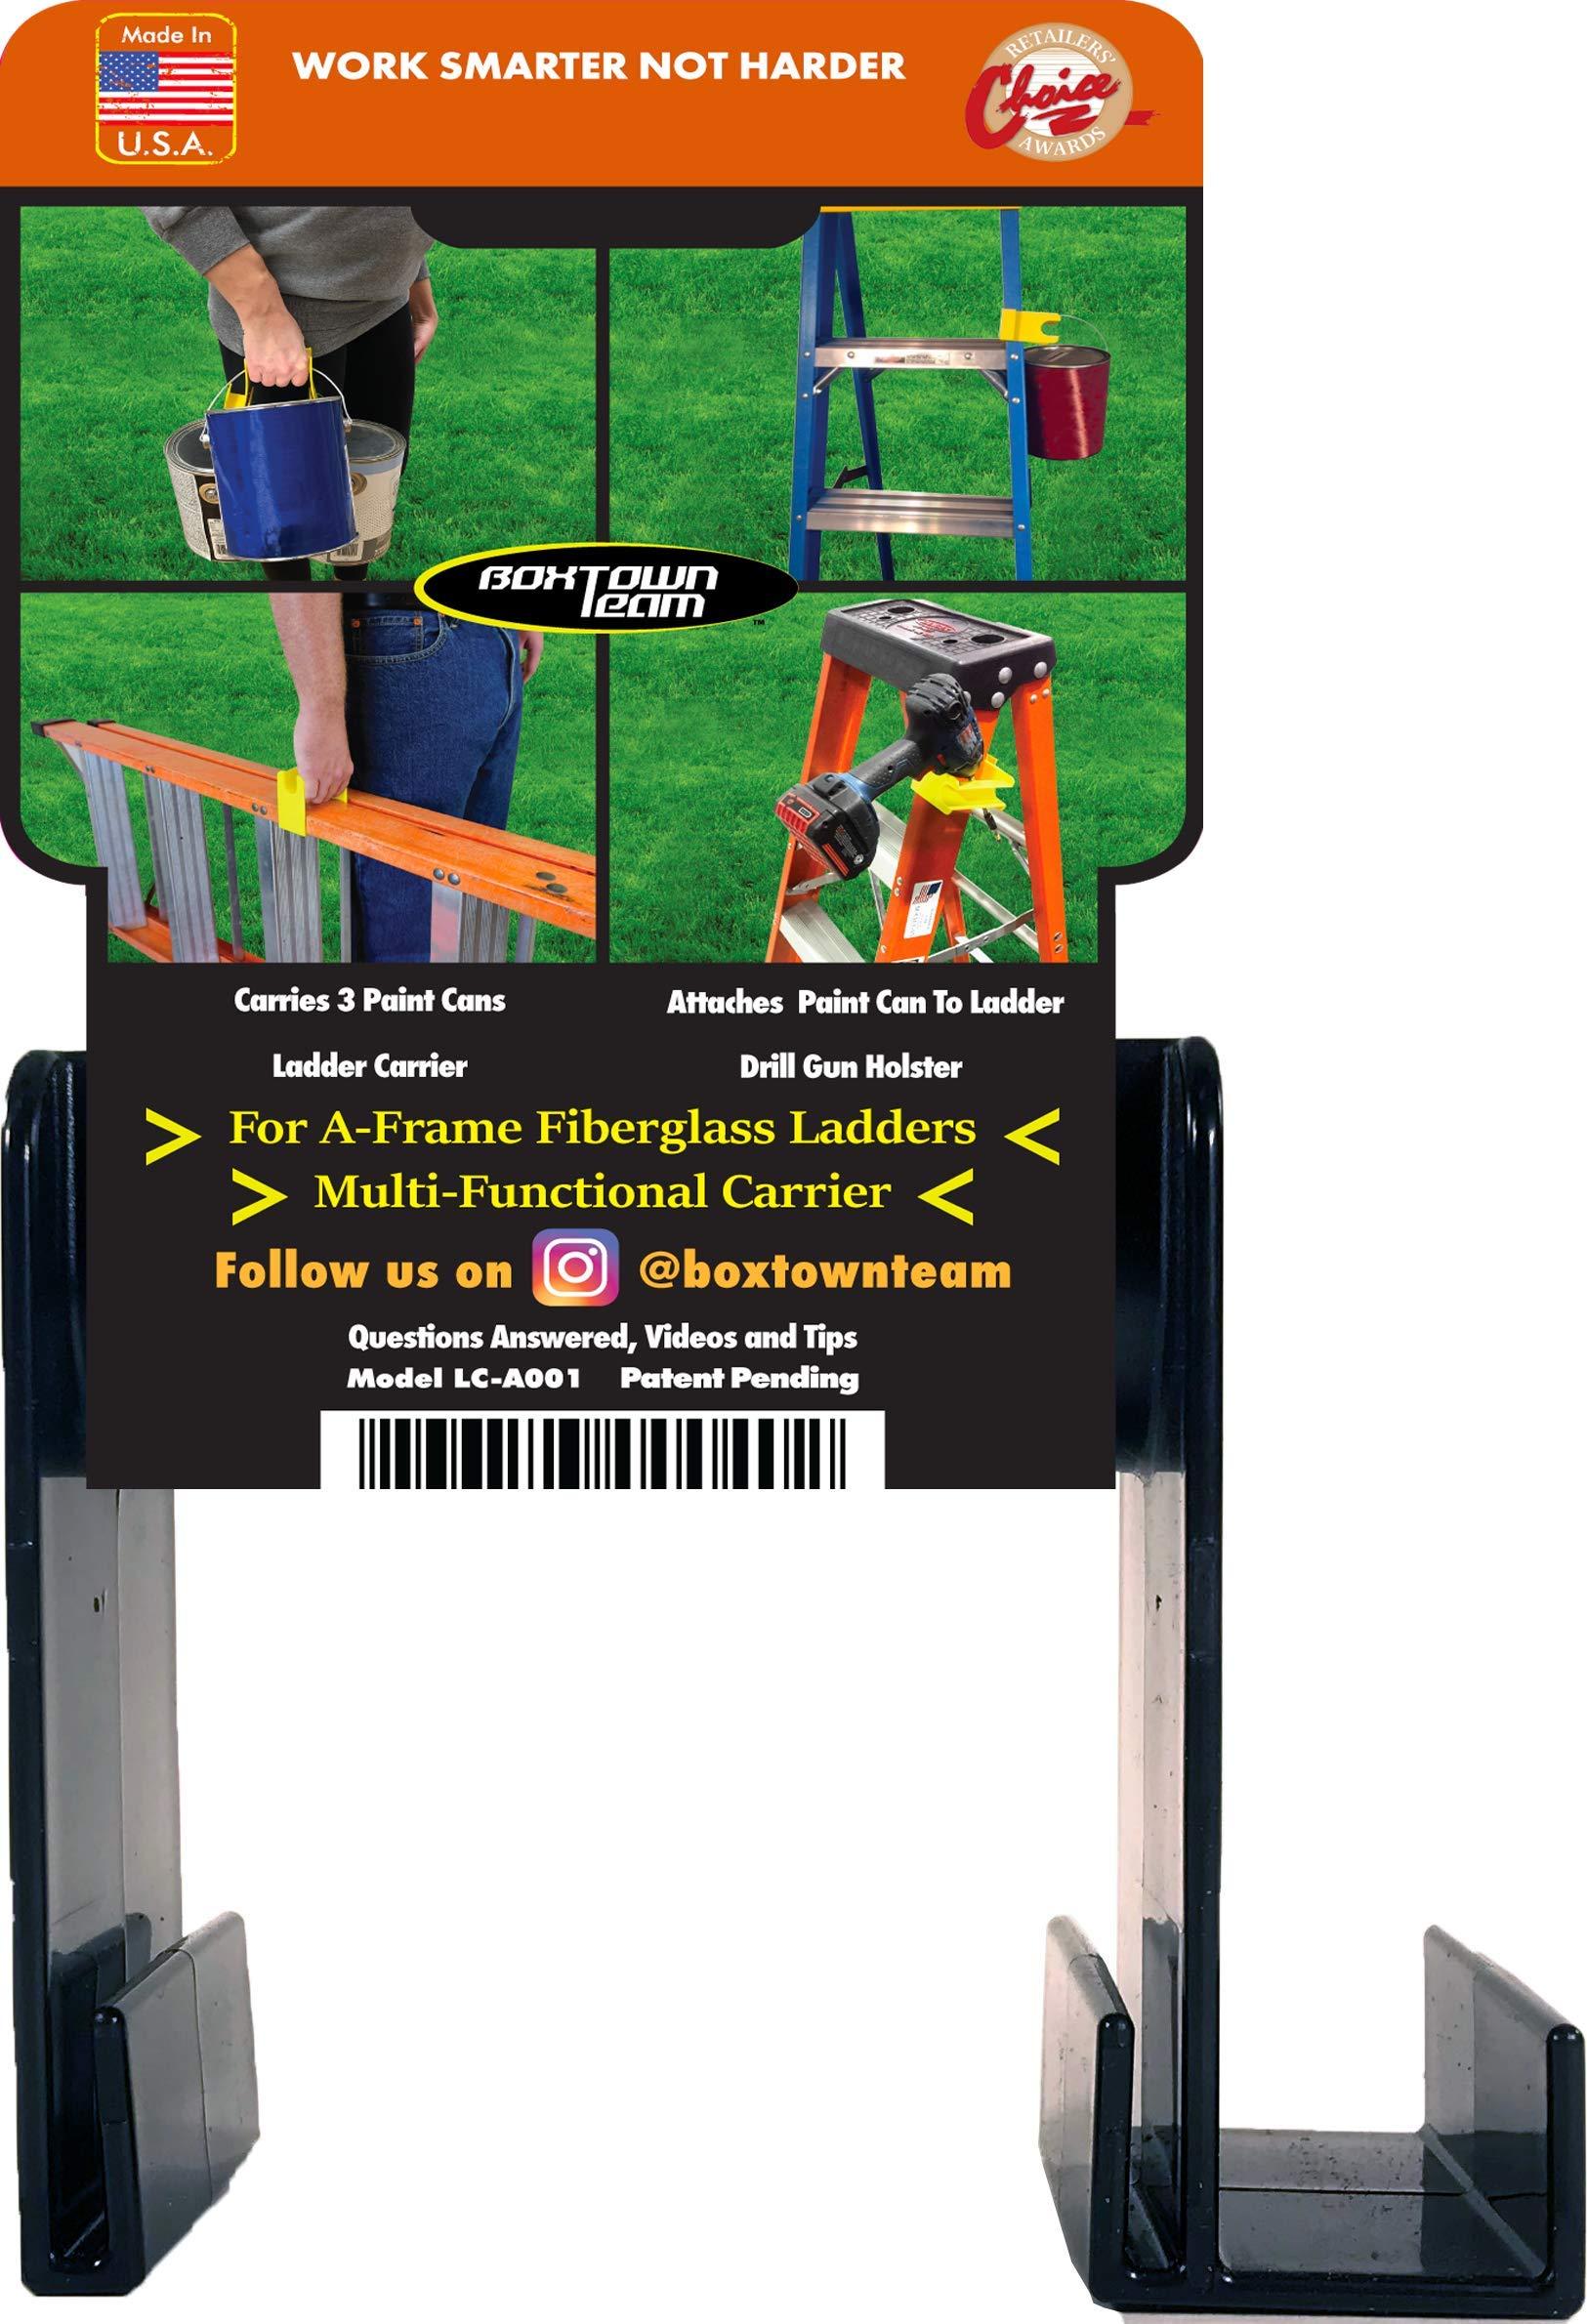 Boxtown Team Ladder Carrier (Black), Ladder Handle, Ladder Accessories, Little Giant Handle, Drill Gun Holster, Ladder Paint can Holder, Multipurpose Tool, Multi Function Tool